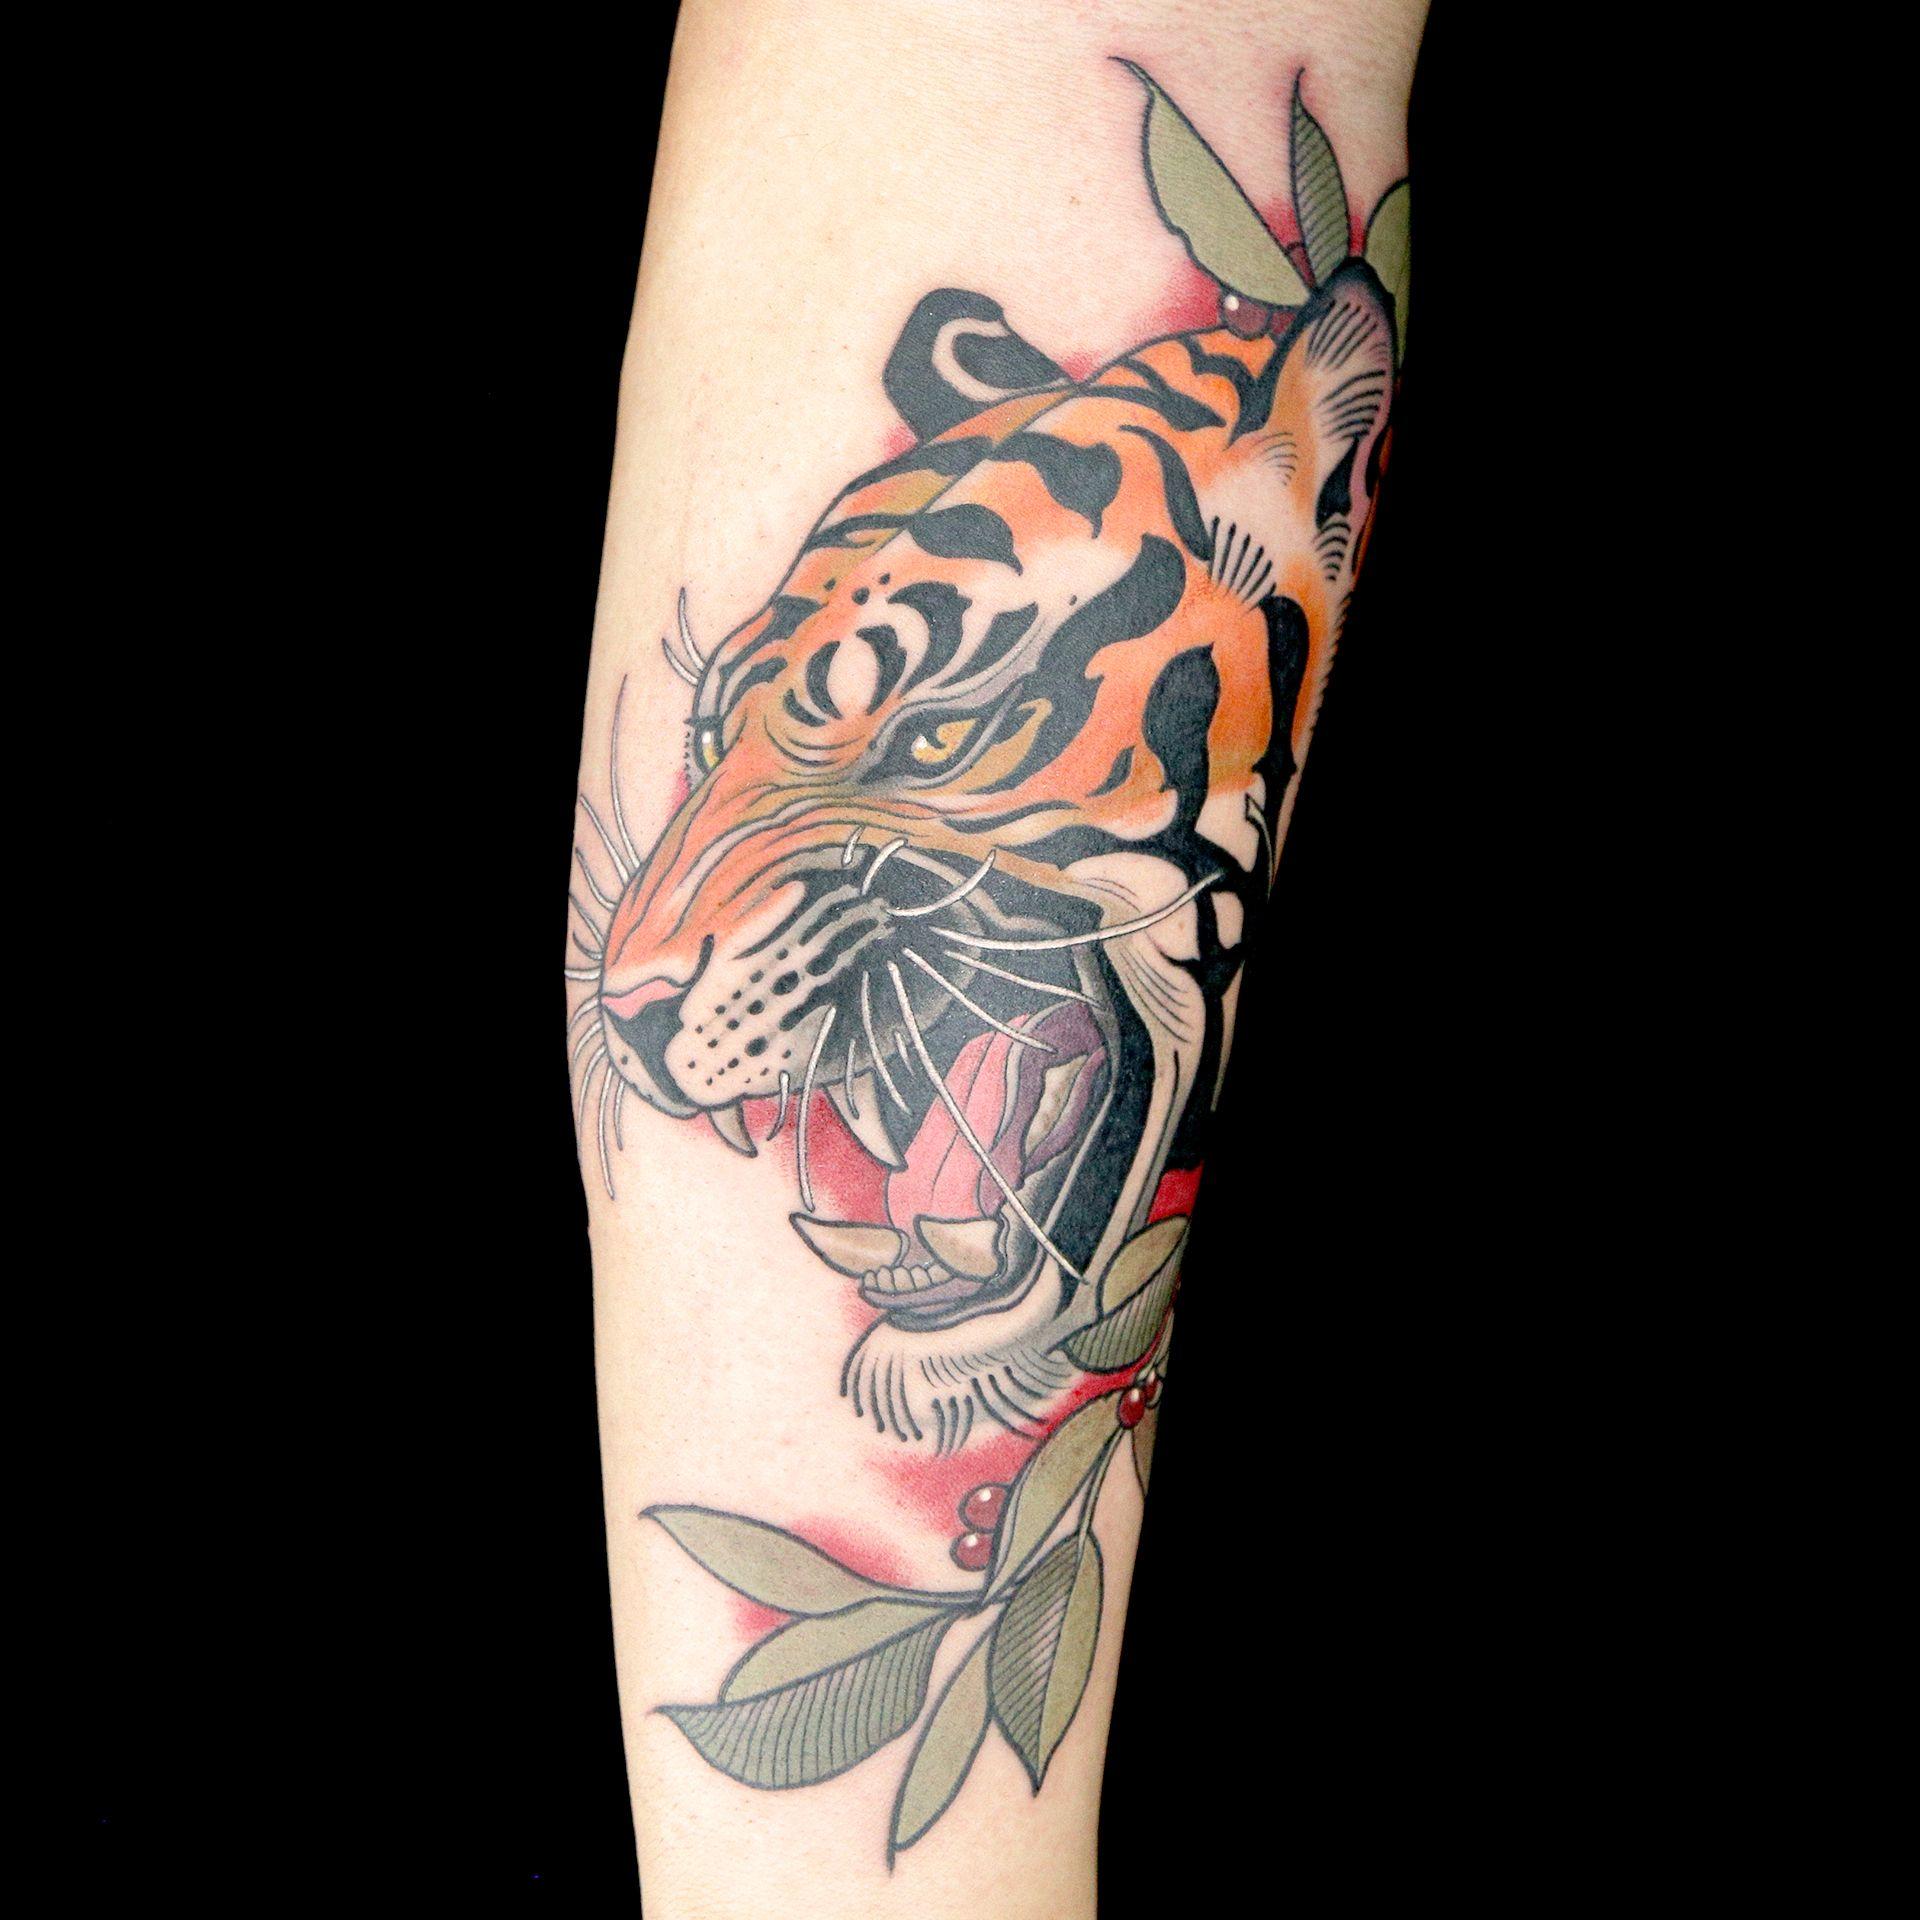 Tiger Tattoo by Old Town Ink (Bubba Irwin & DJ Tambe